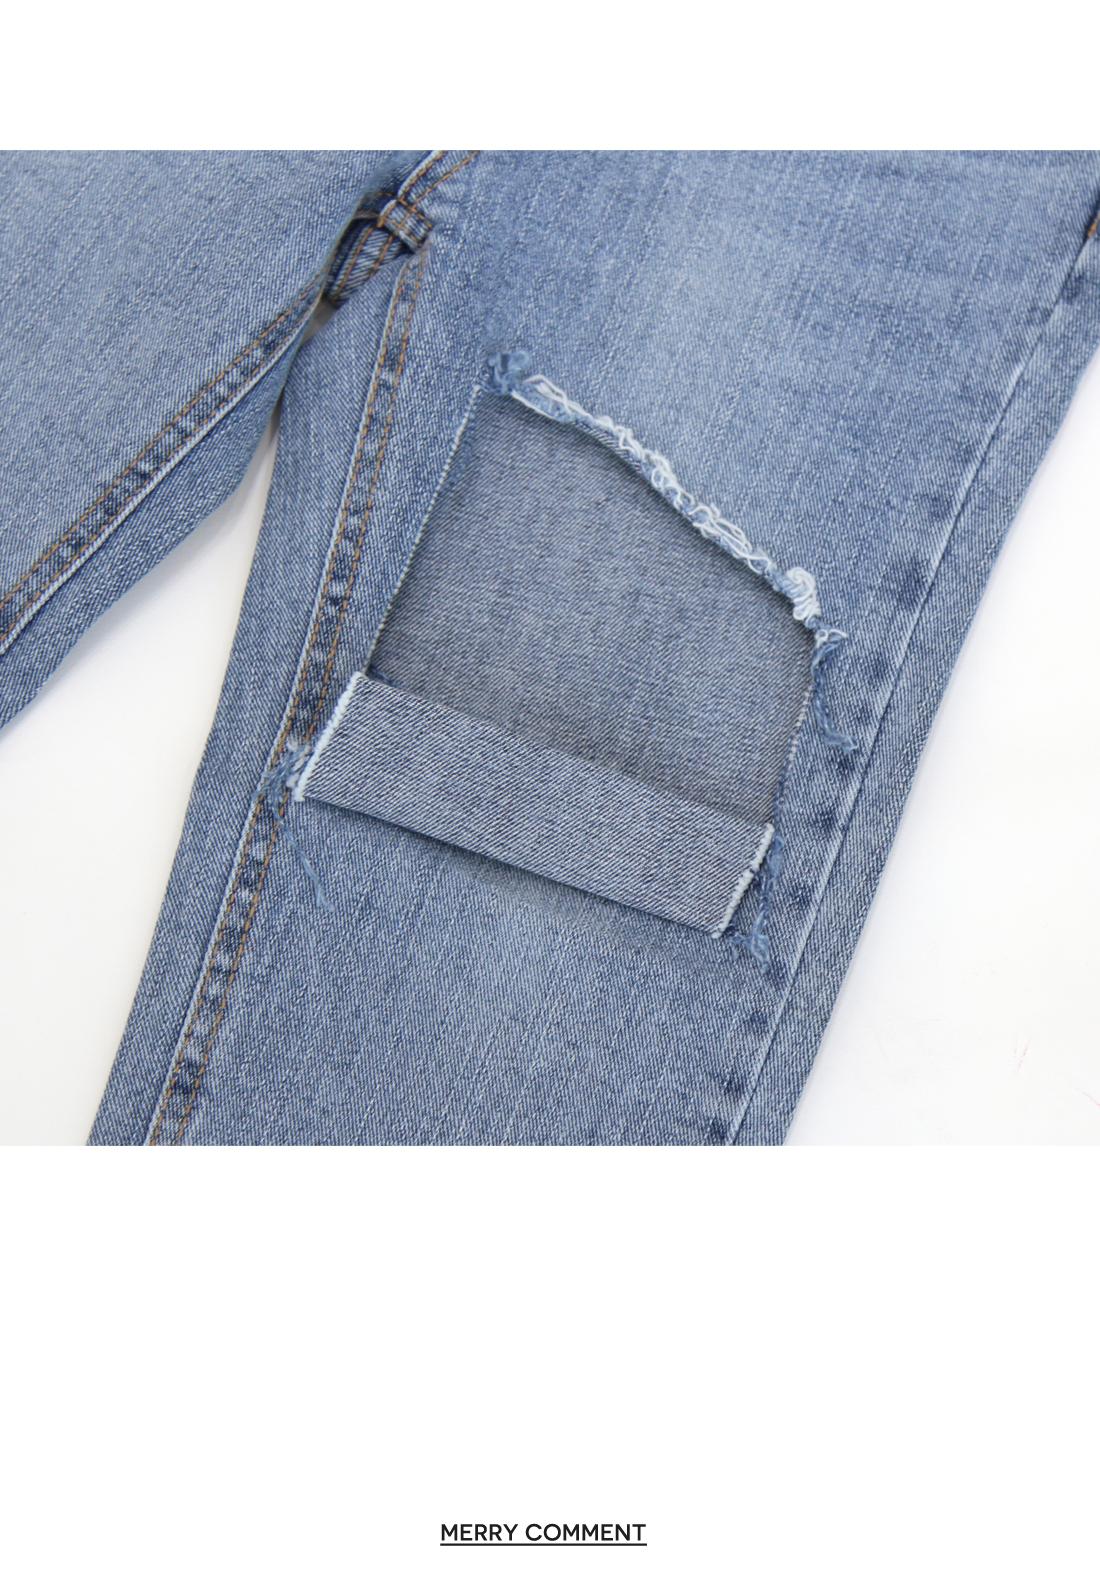 Unique Ripped Slim Date Jeans